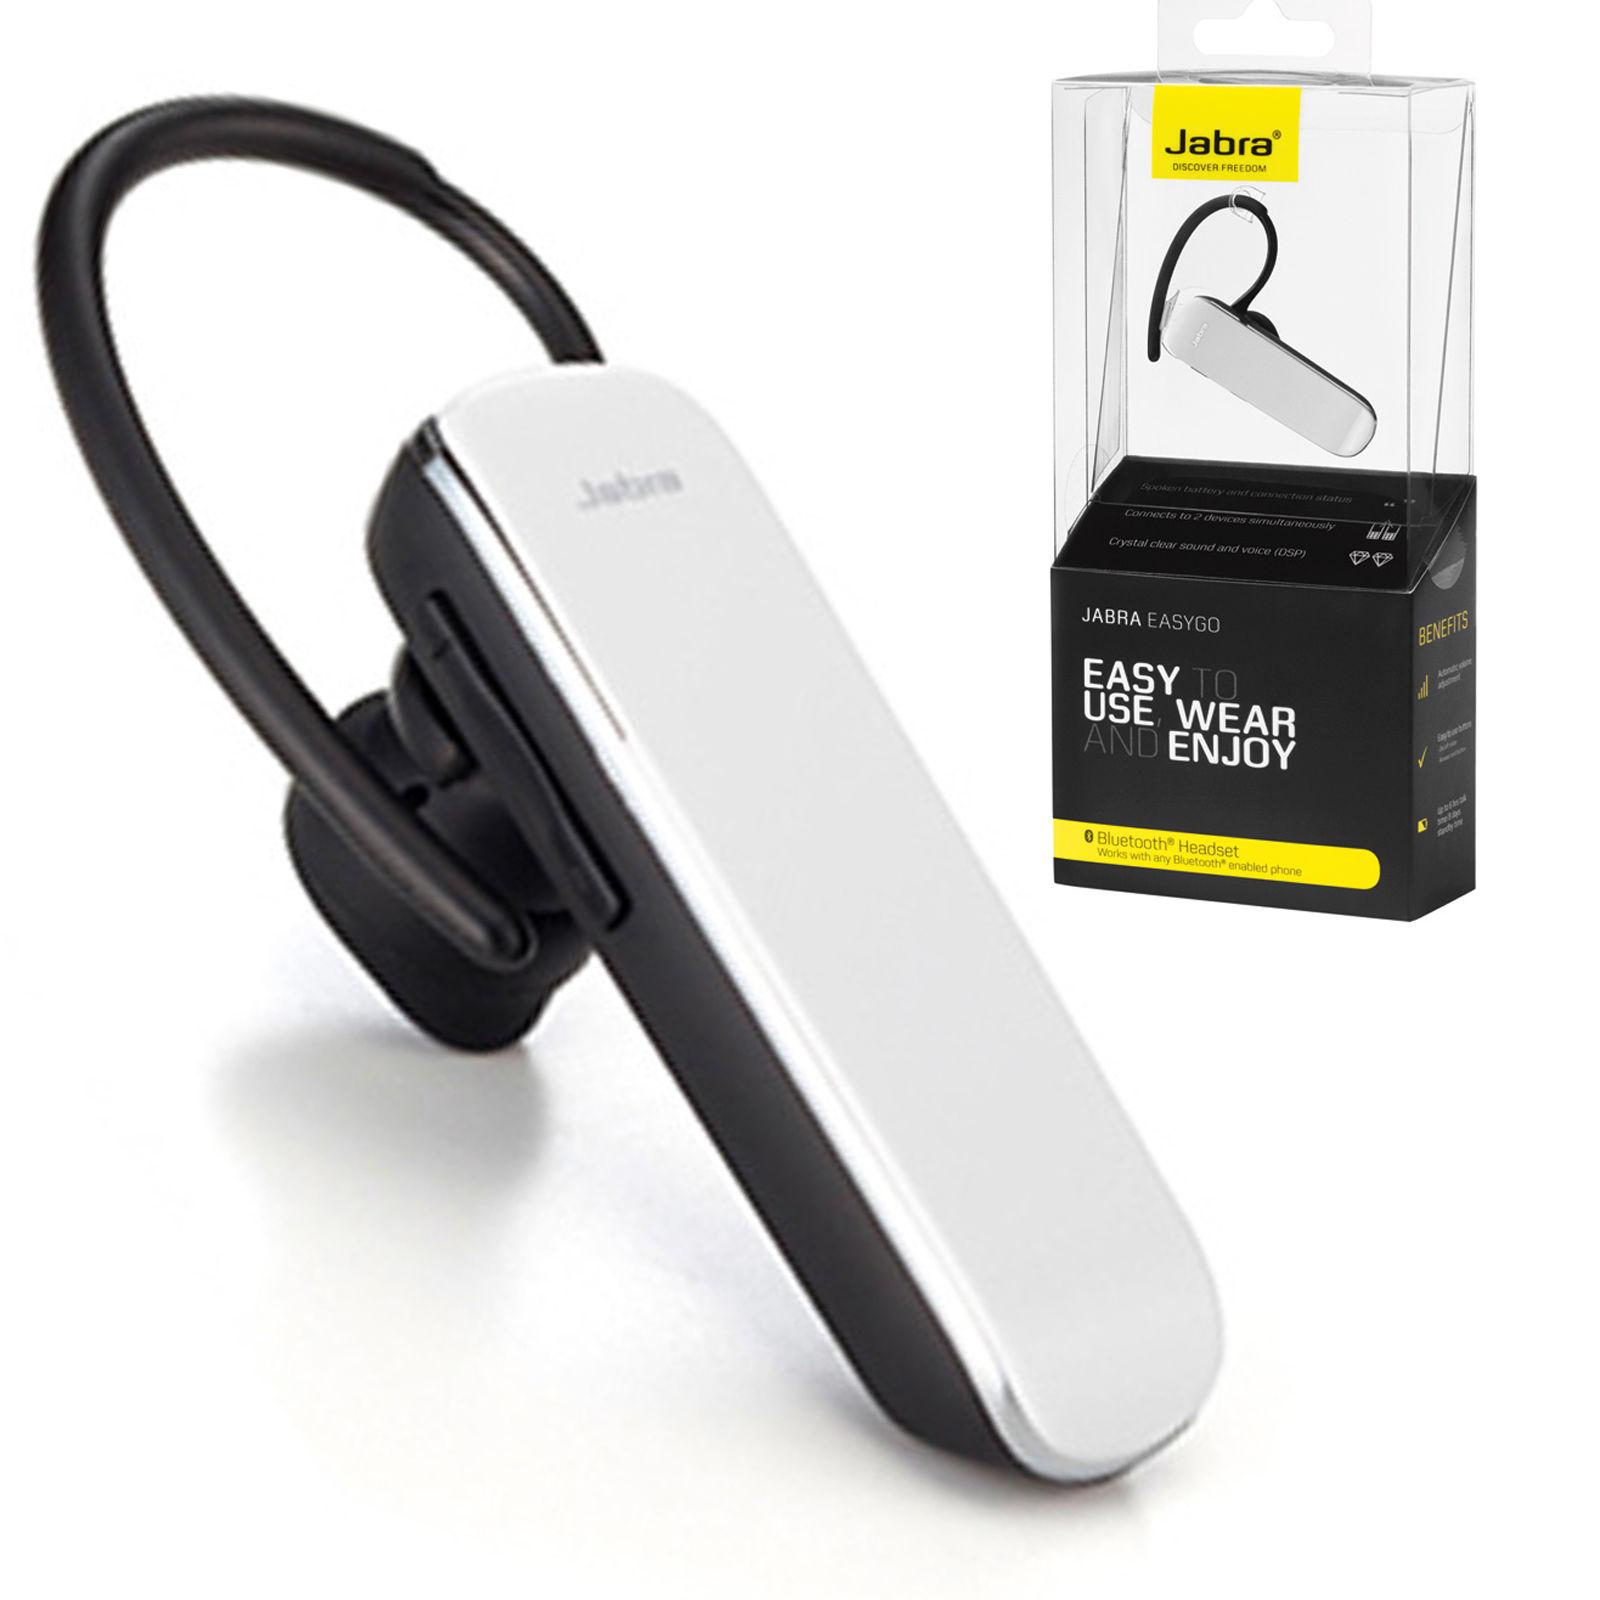 0aa1e8c841a Genuine Jabra Easy Go Bluetooth Headset Handsfree For Samsung Galaxy S3 S4  S5 S6